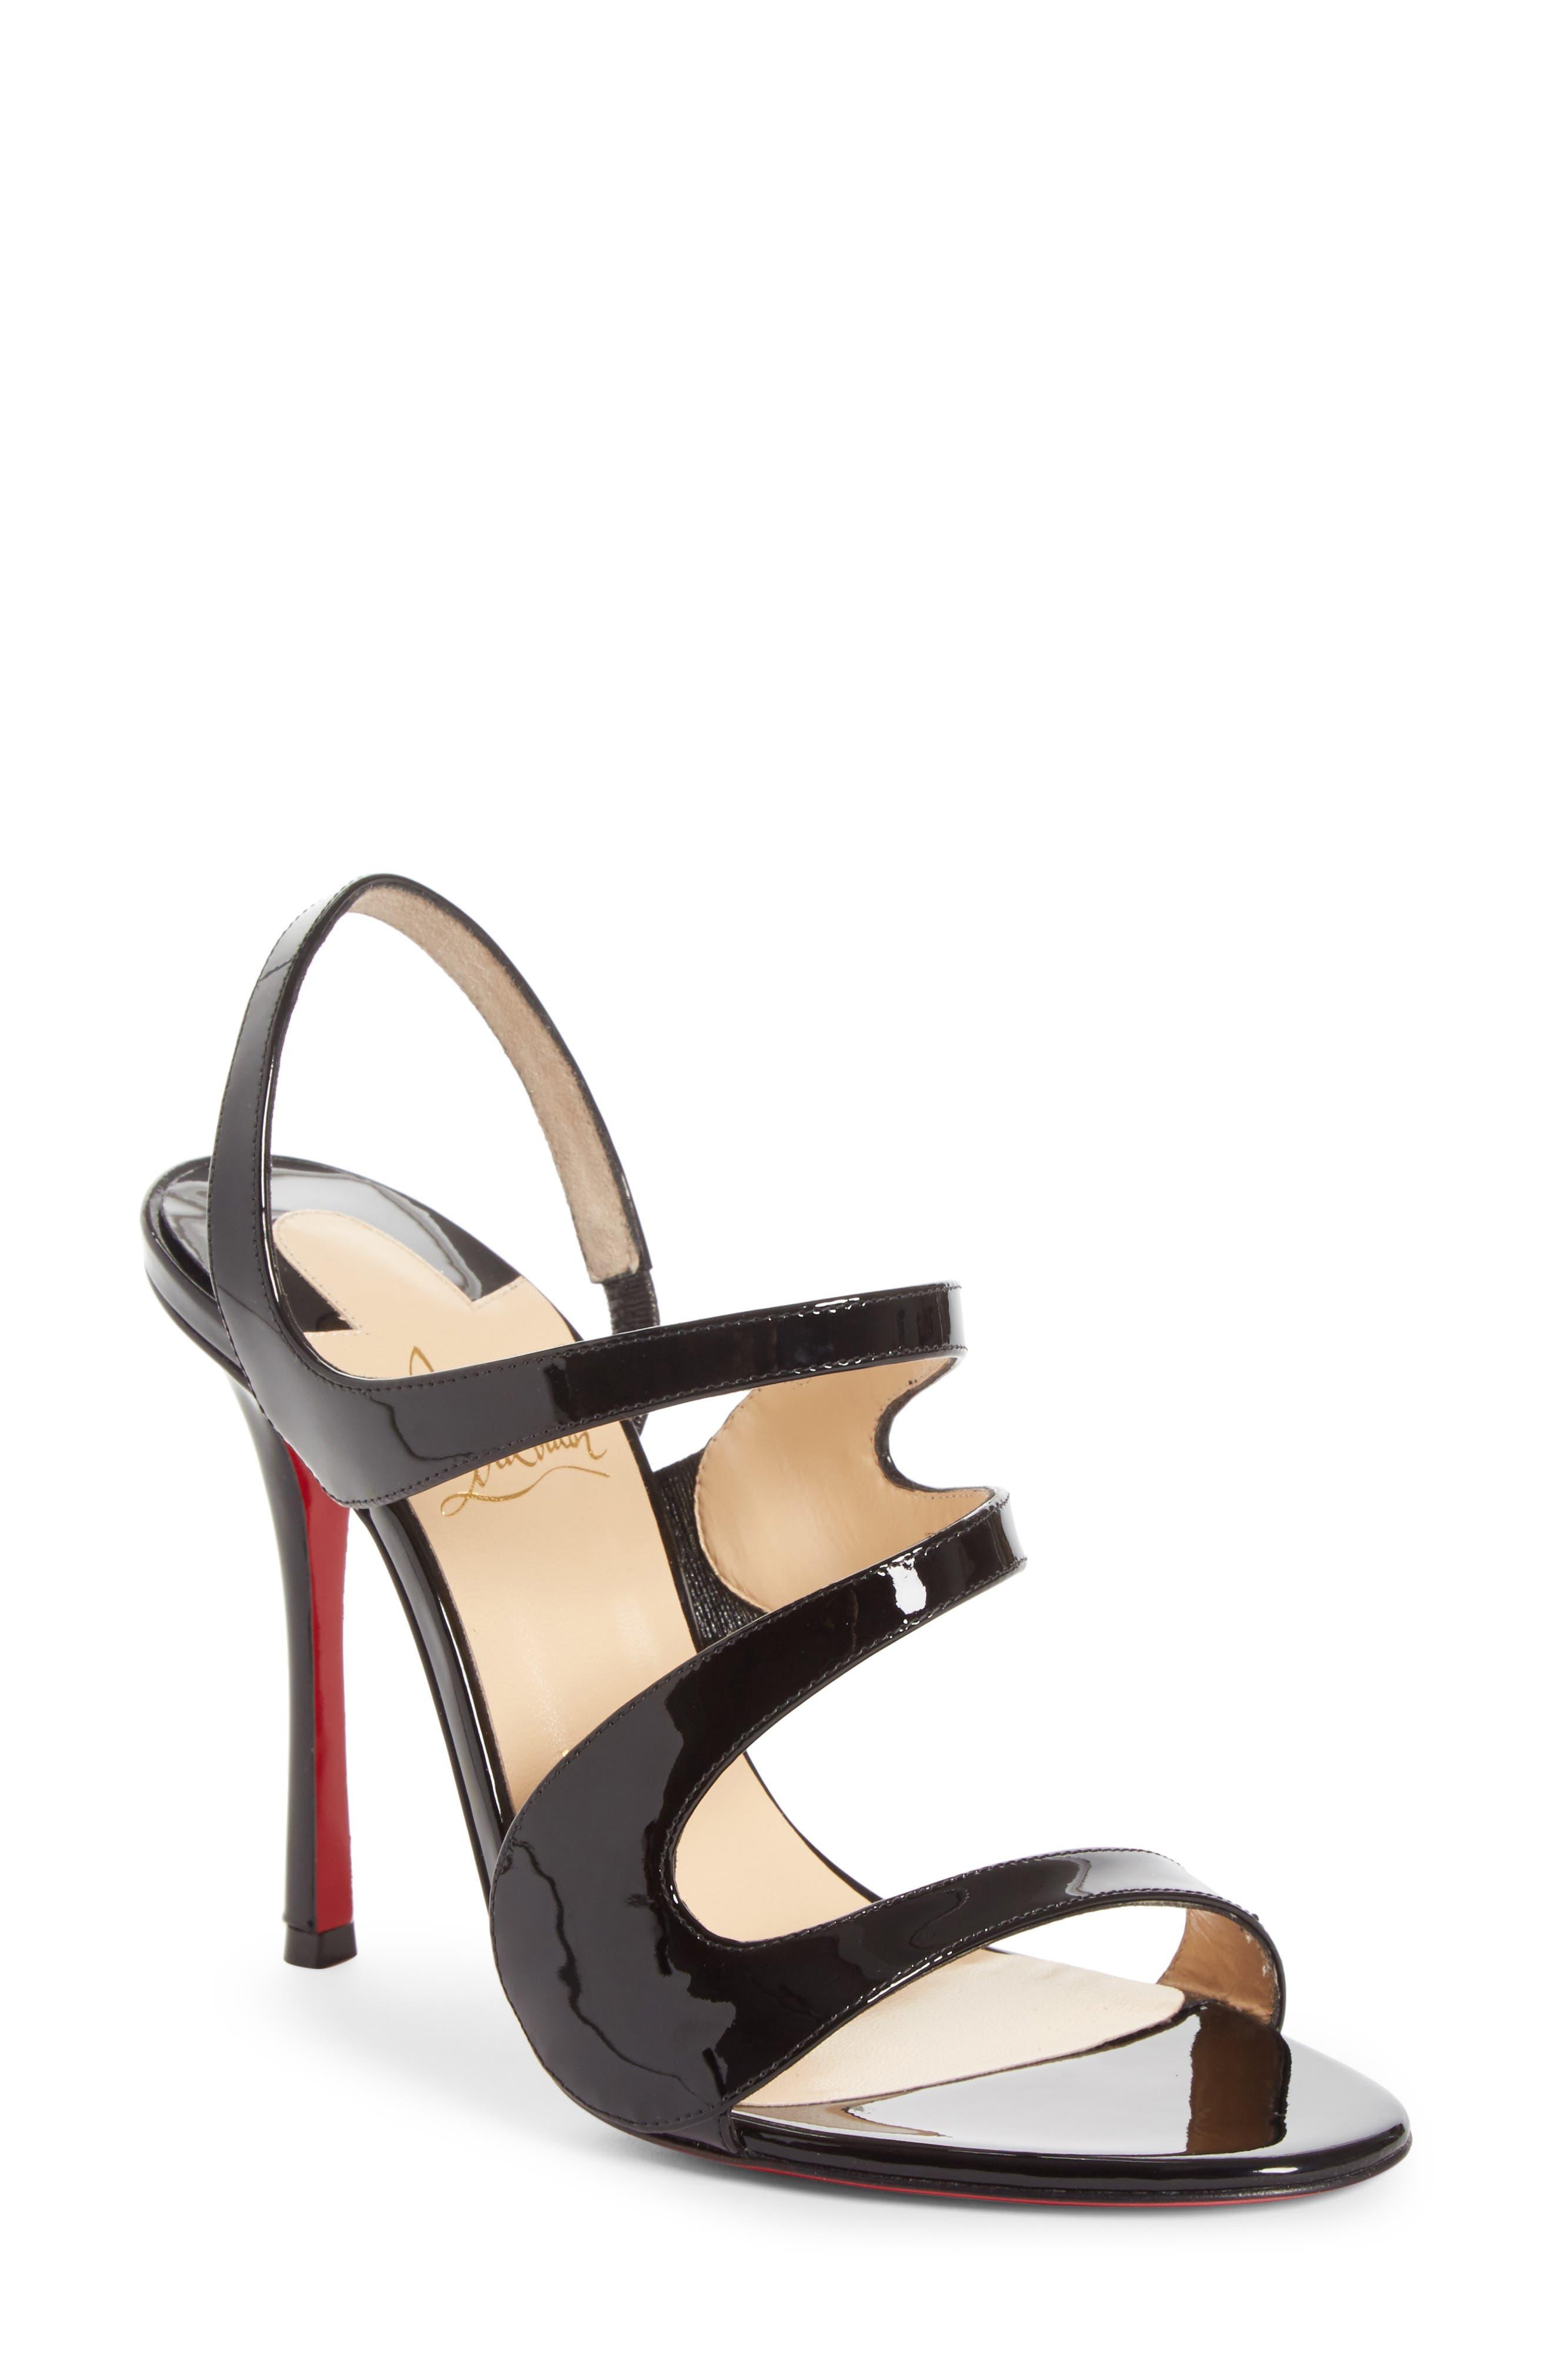 Vavazou Slingback Sandal,                         Main,                         color, BLACK